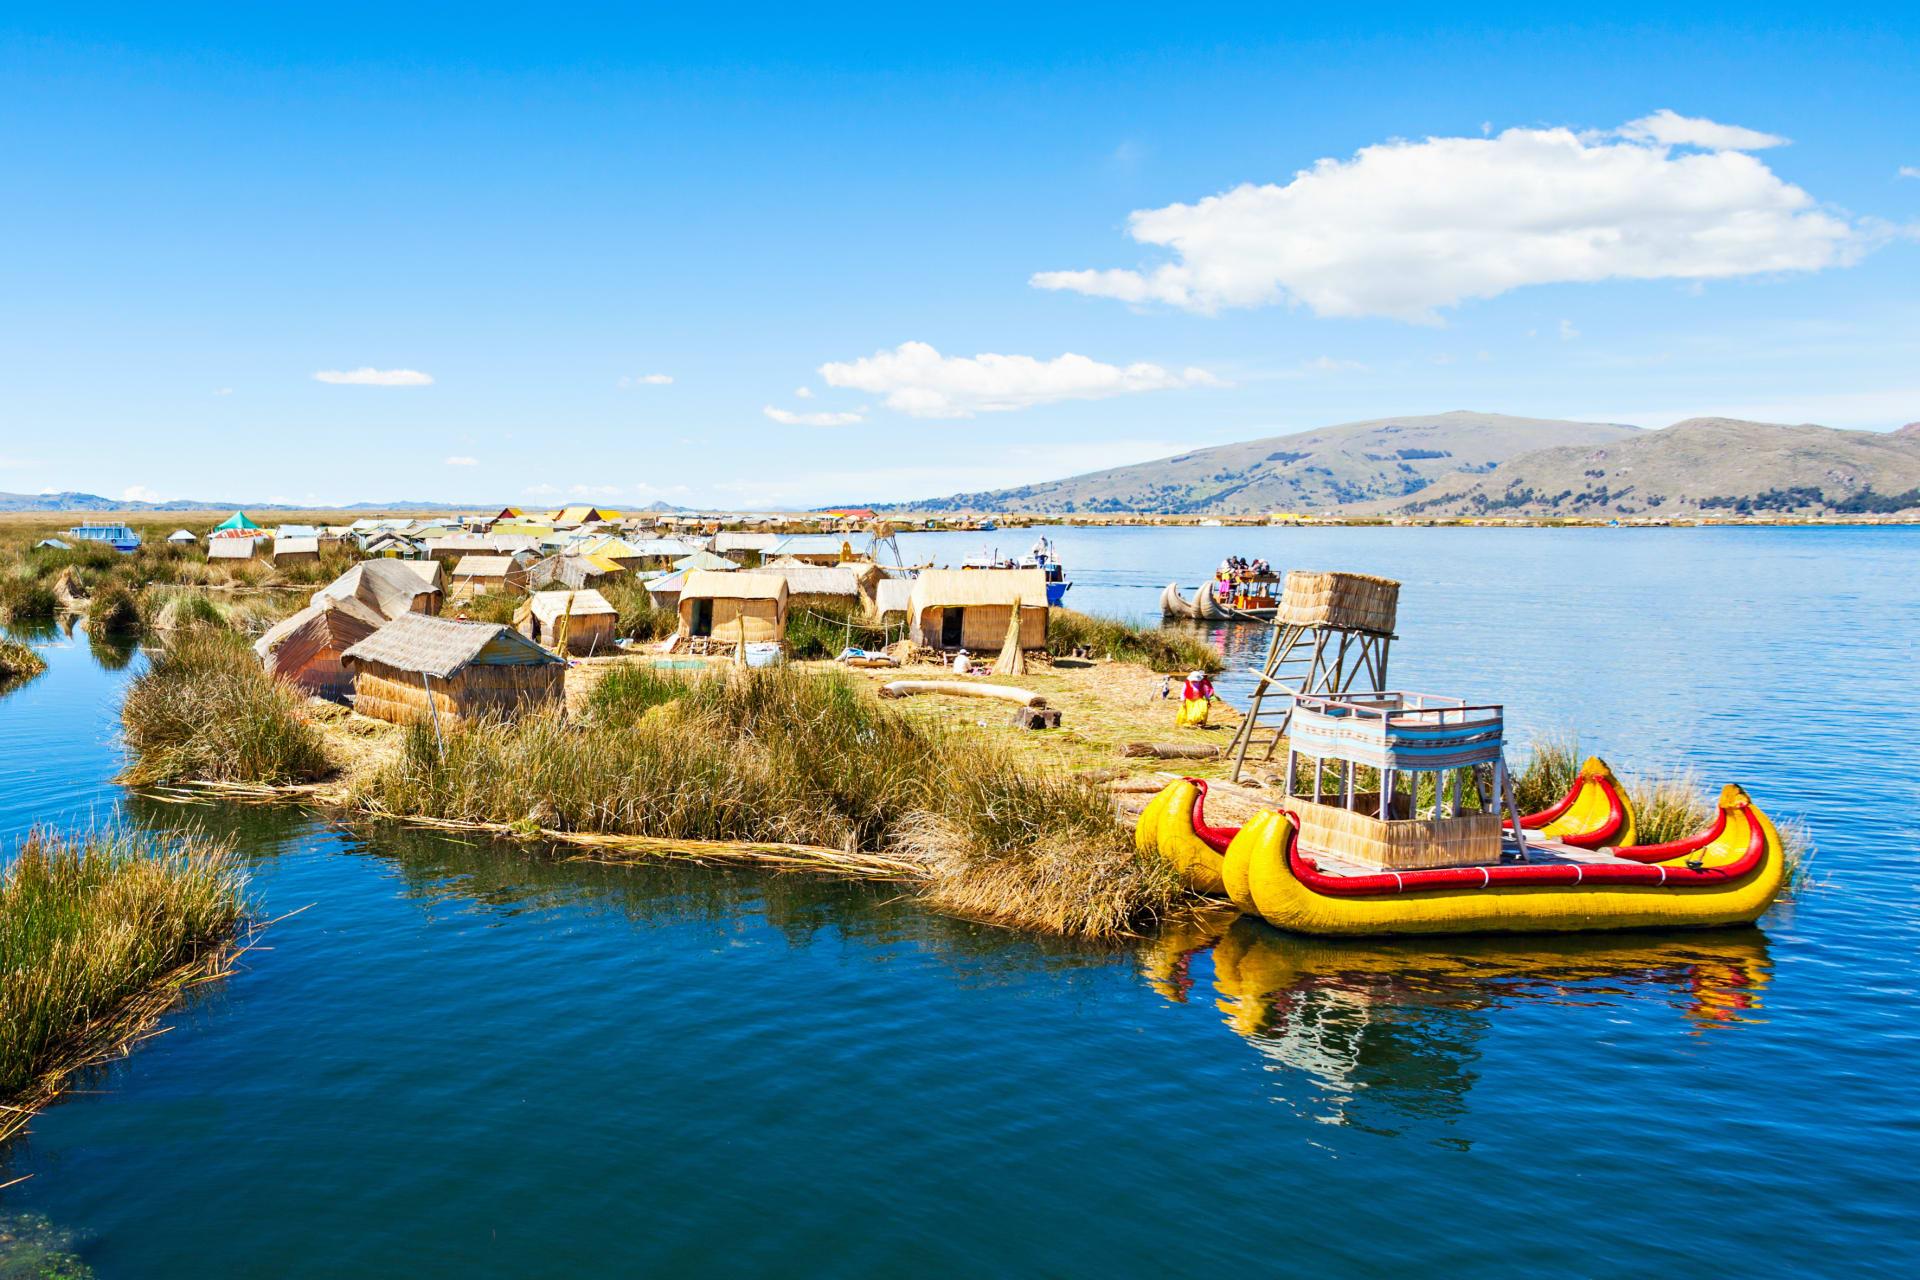 Lake Titicaca - Peru - Lake Titicaca and its Man-made Floating Islands